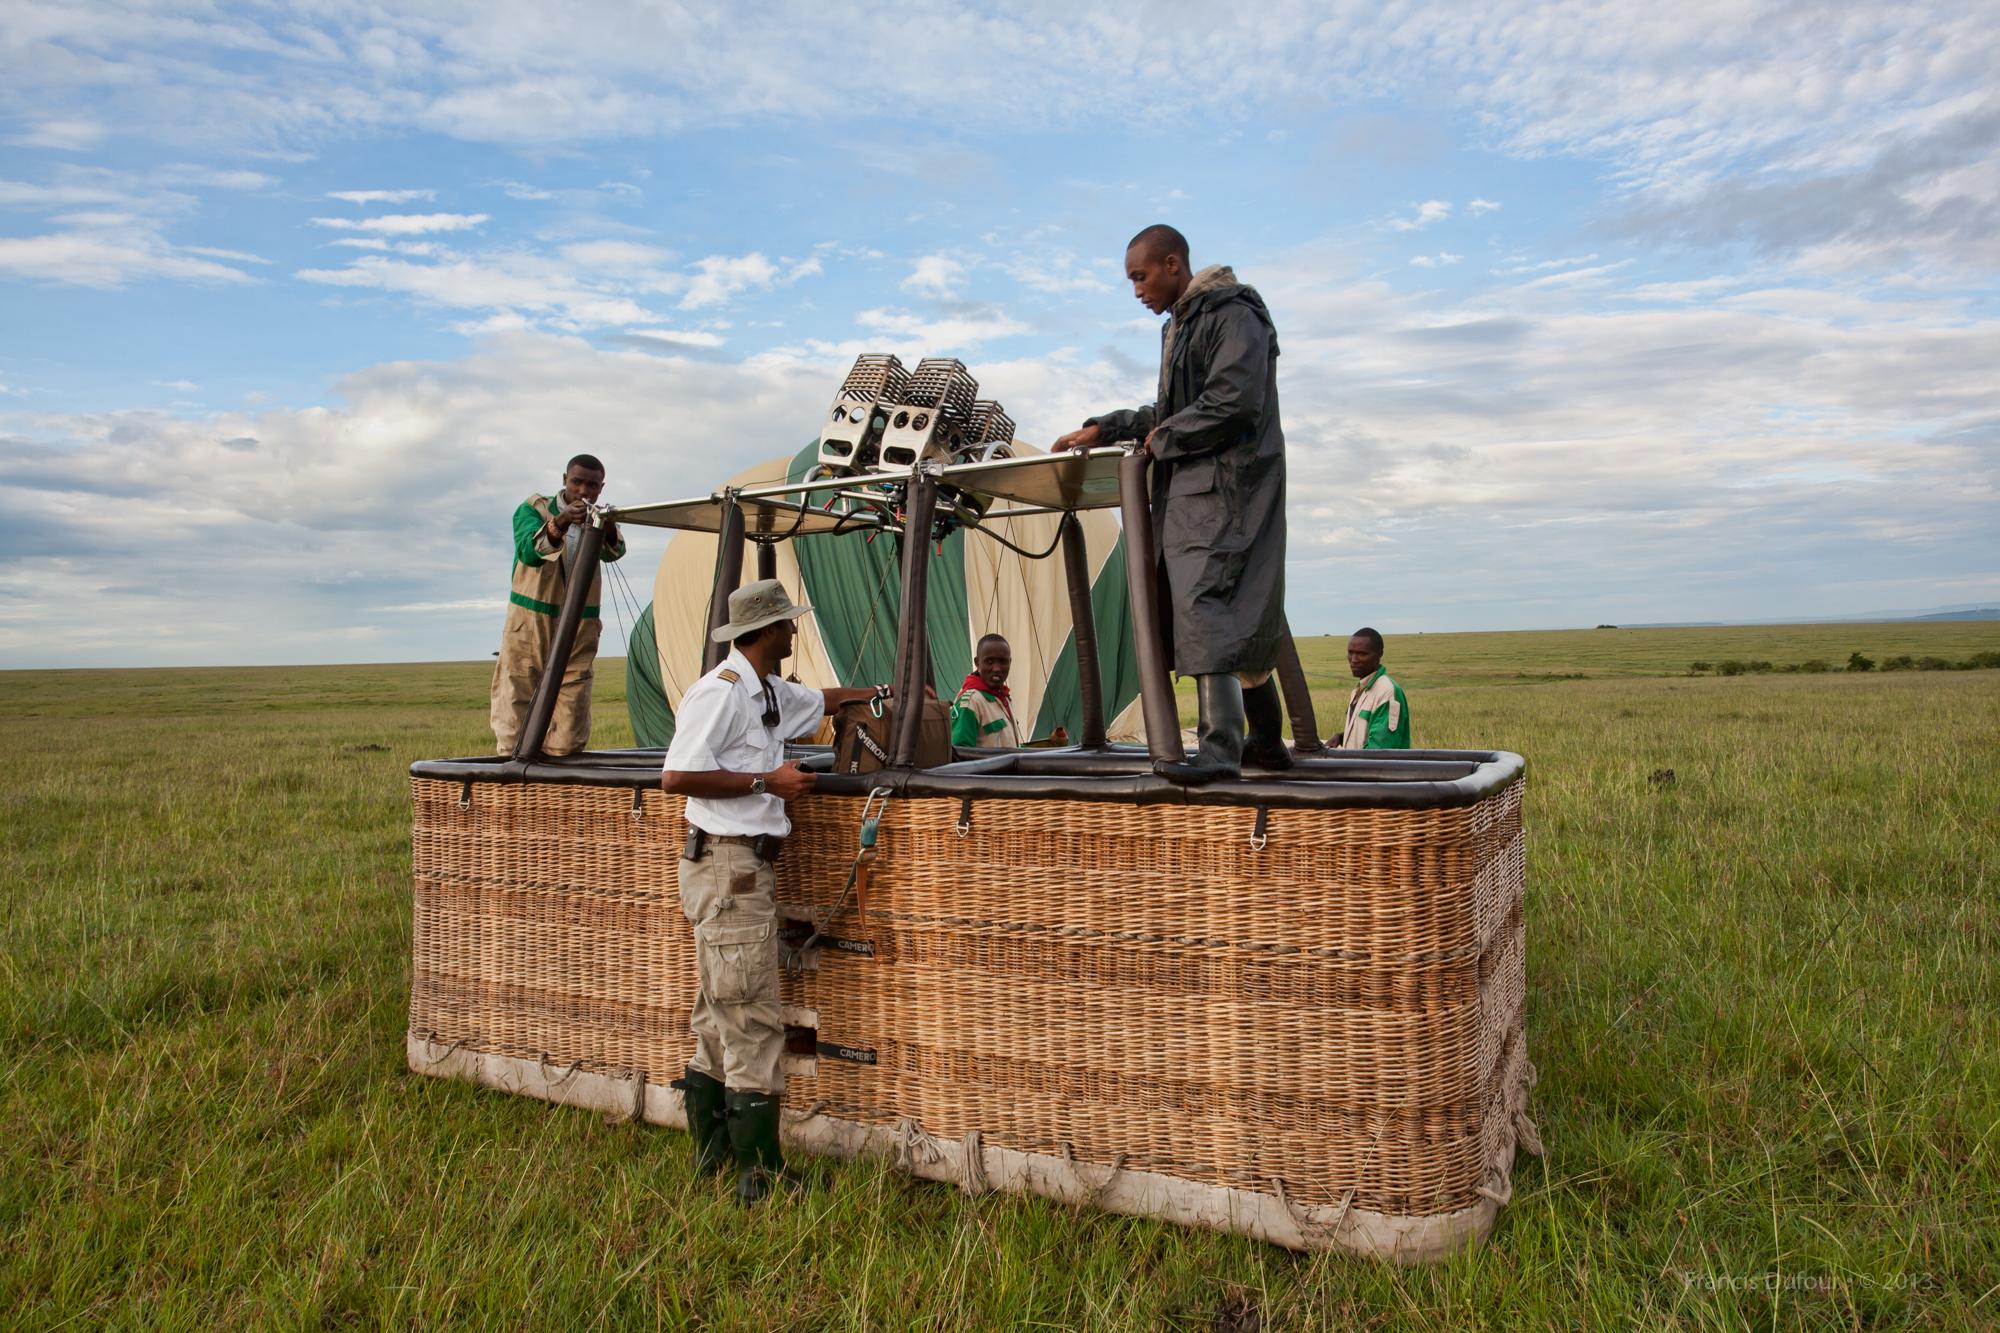 FD-IMG-0284-africa-kenya-masai-mara-balloon-ride